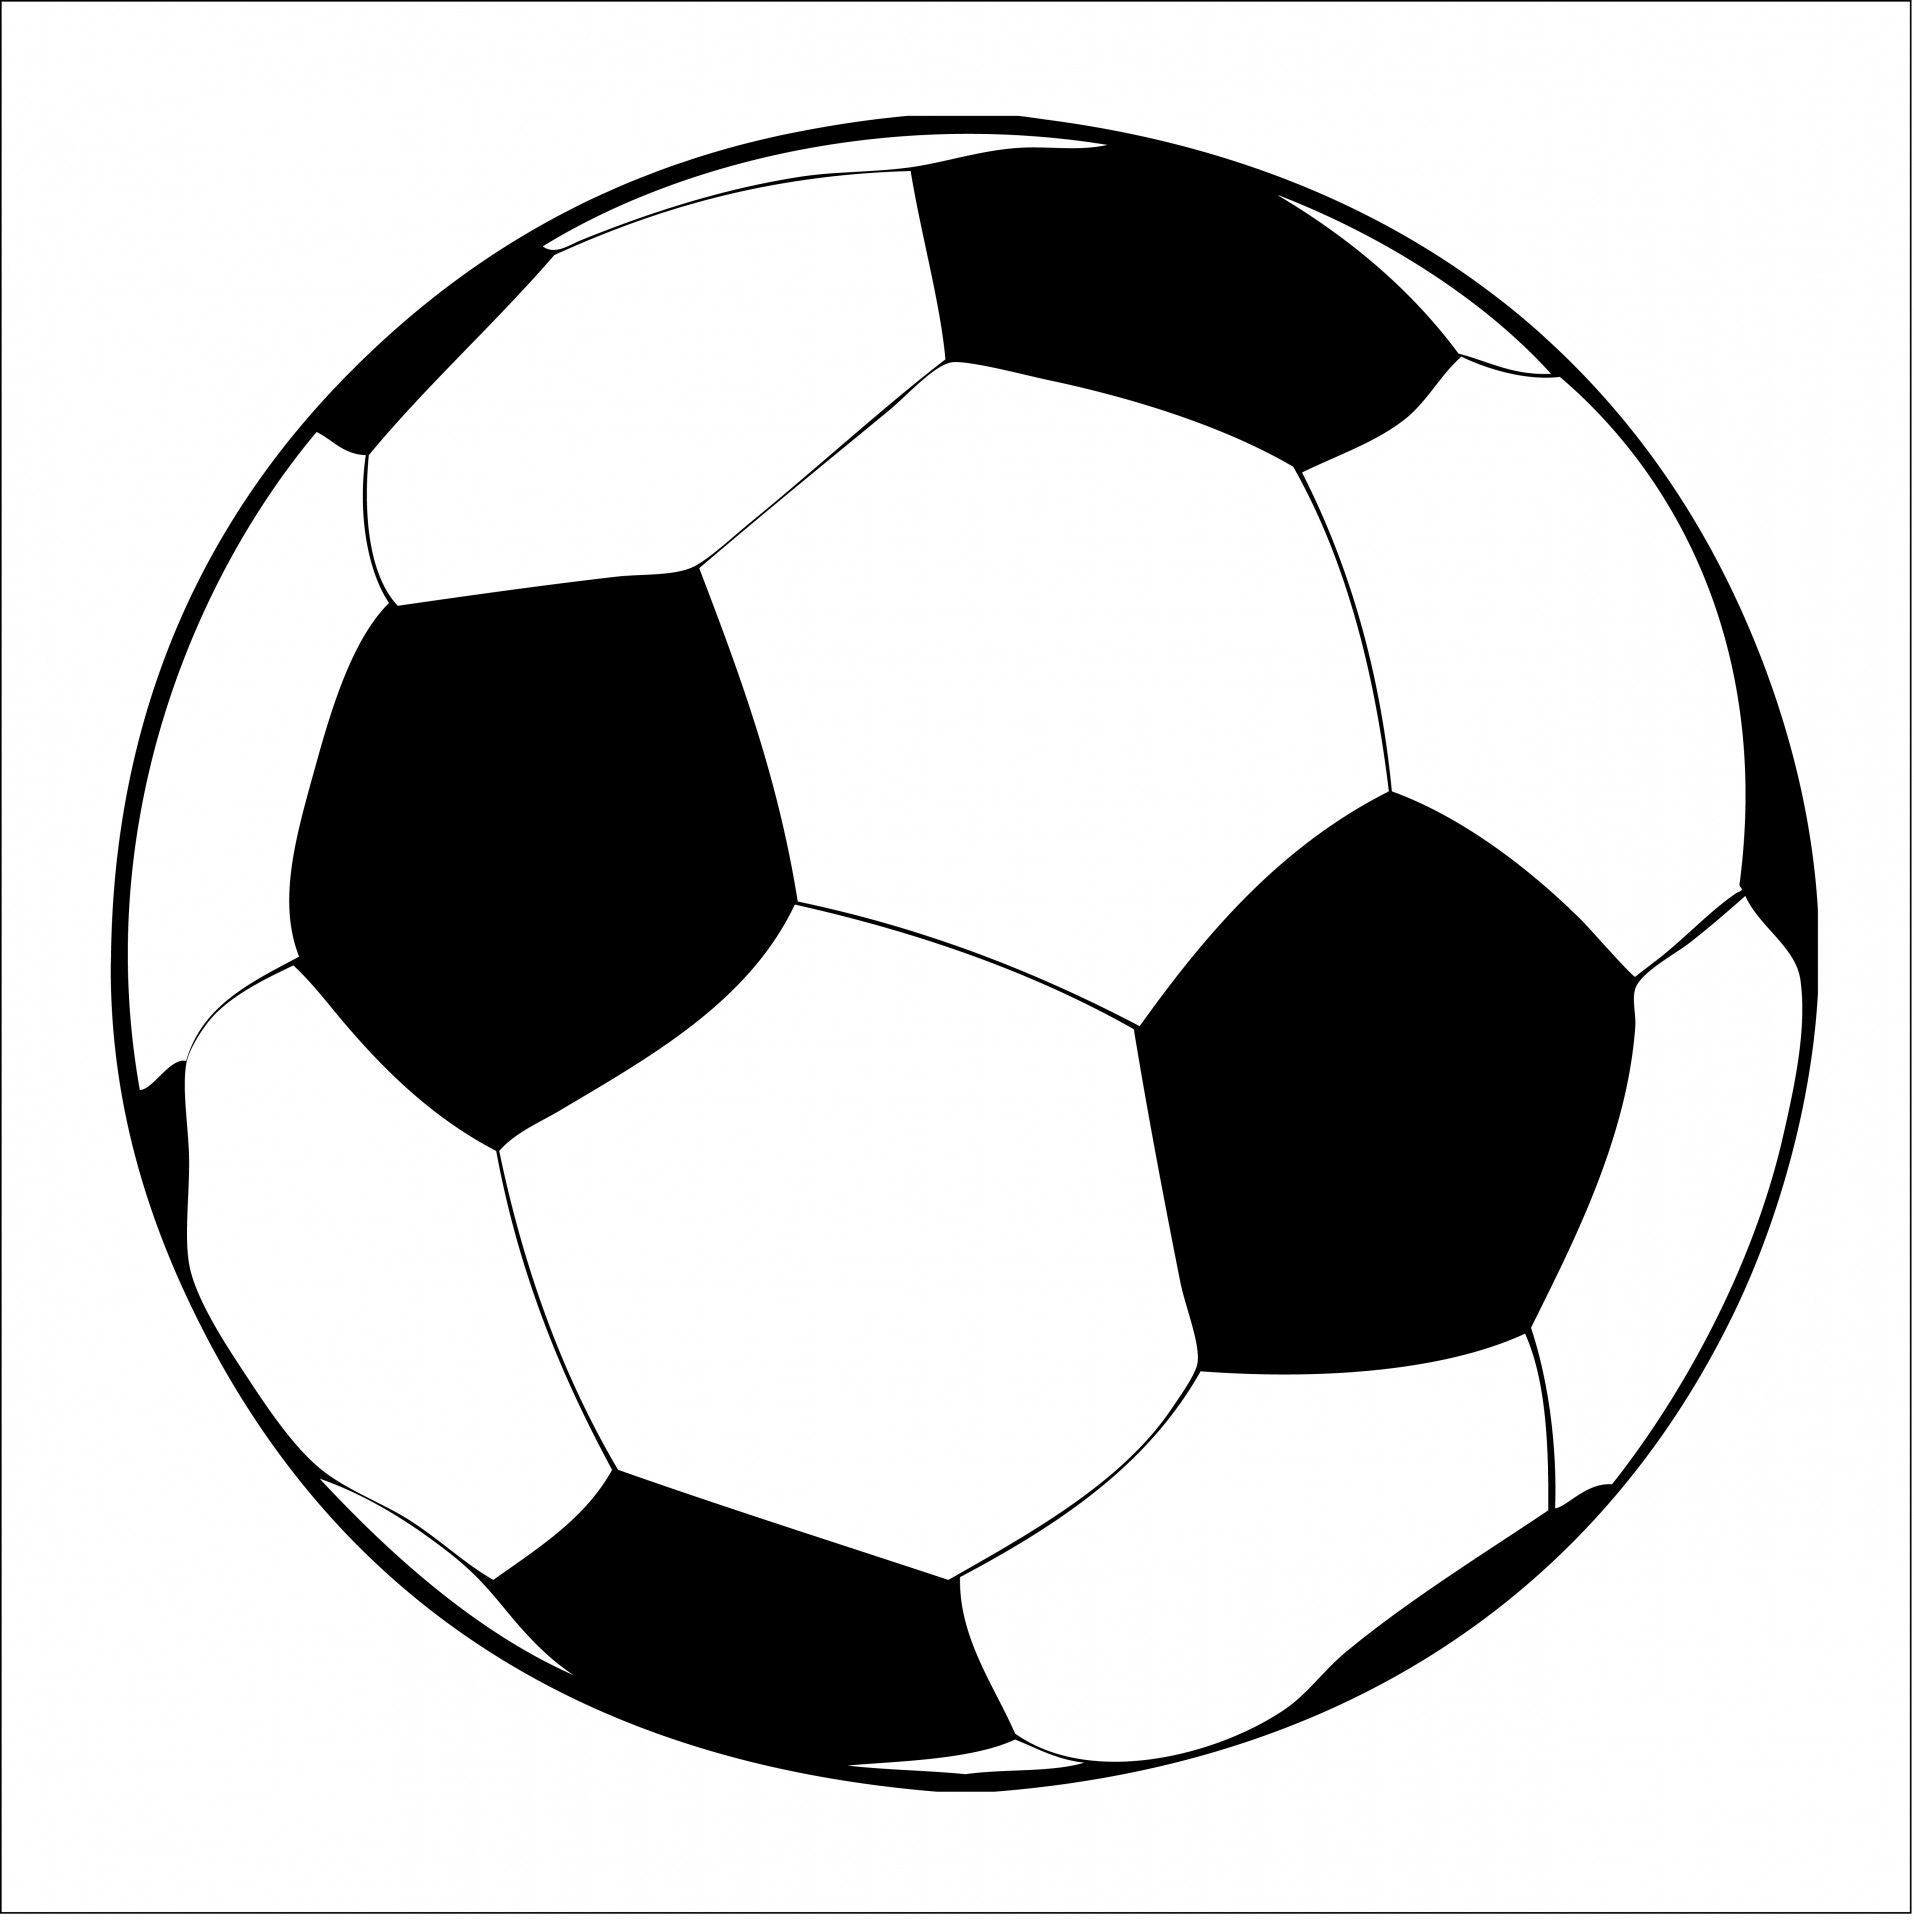 Ball clipart Sports Clipart Ball Clip Soccer